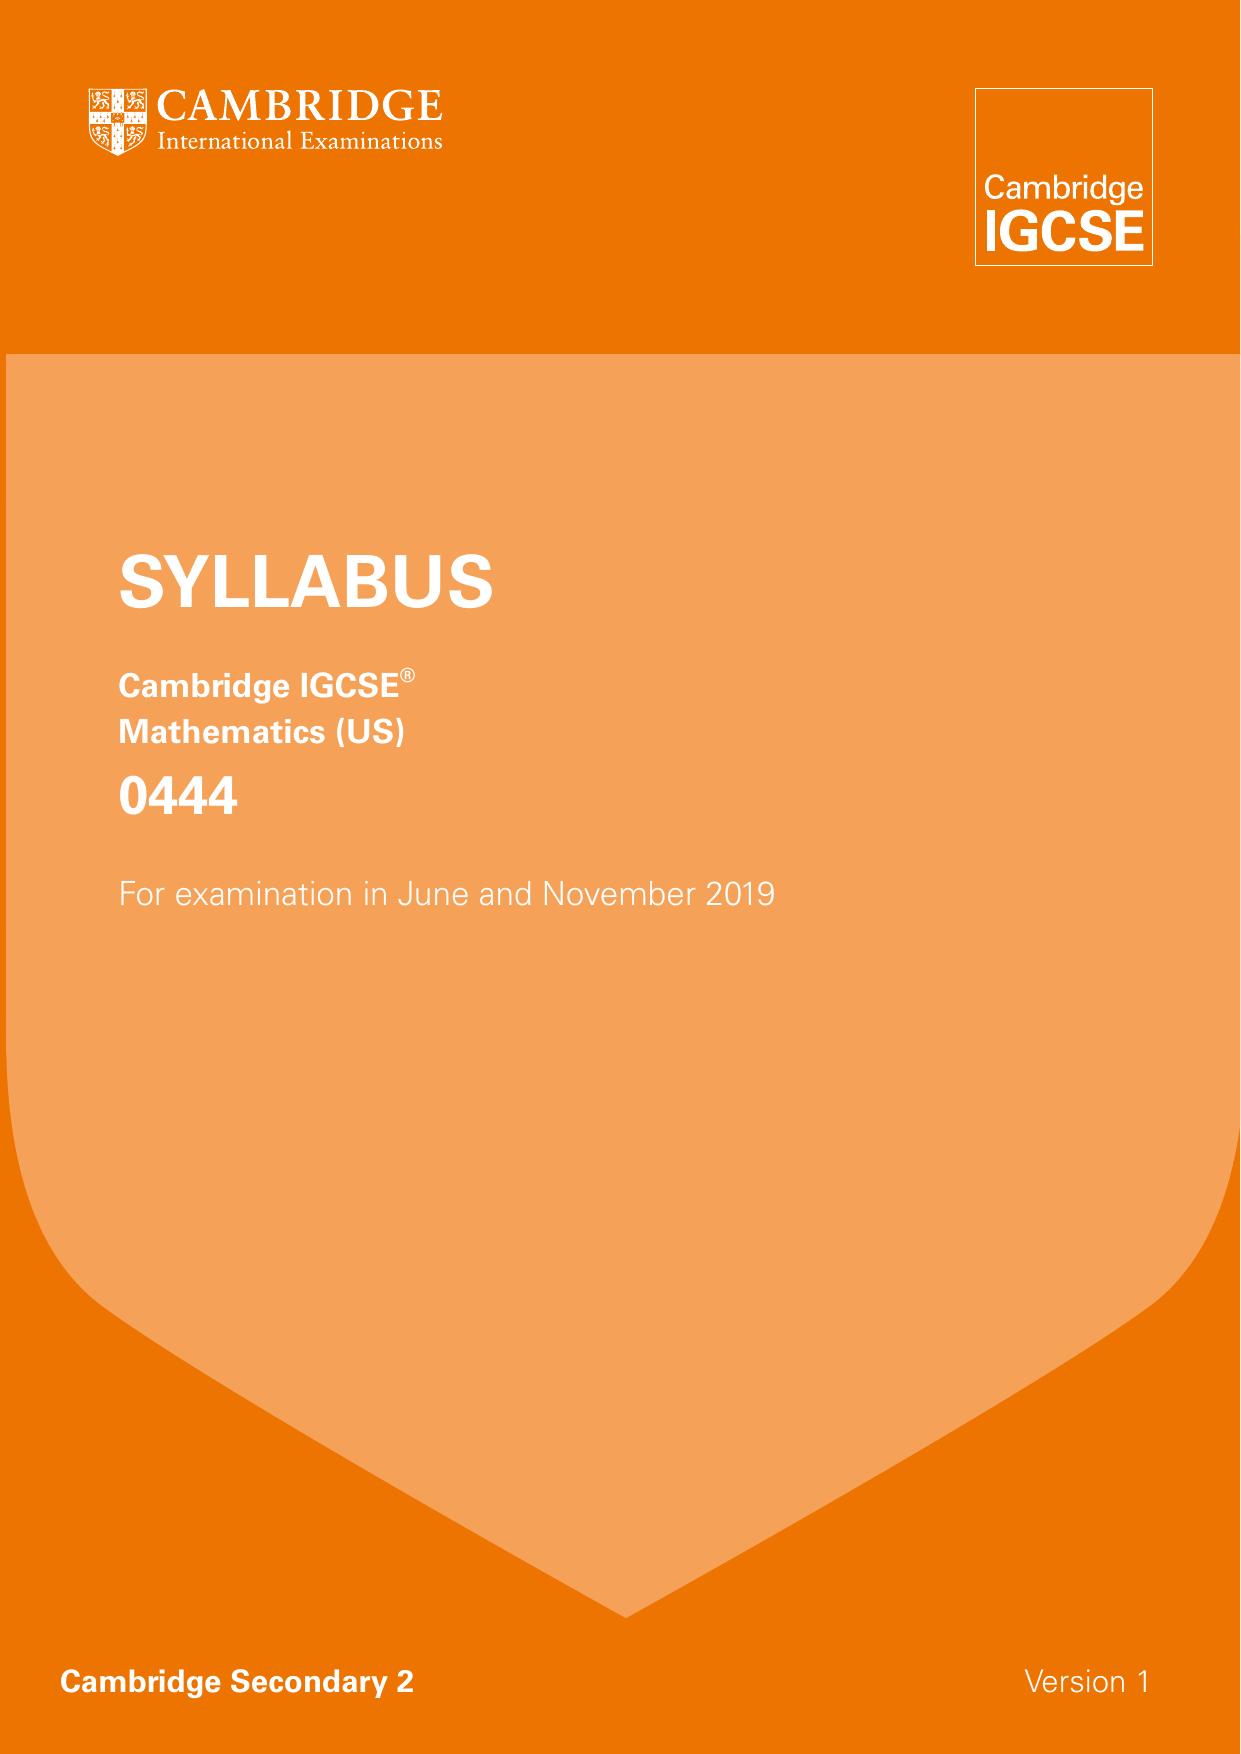 Cambridge IGCSE Mathematics 0444 Curriculum 2019